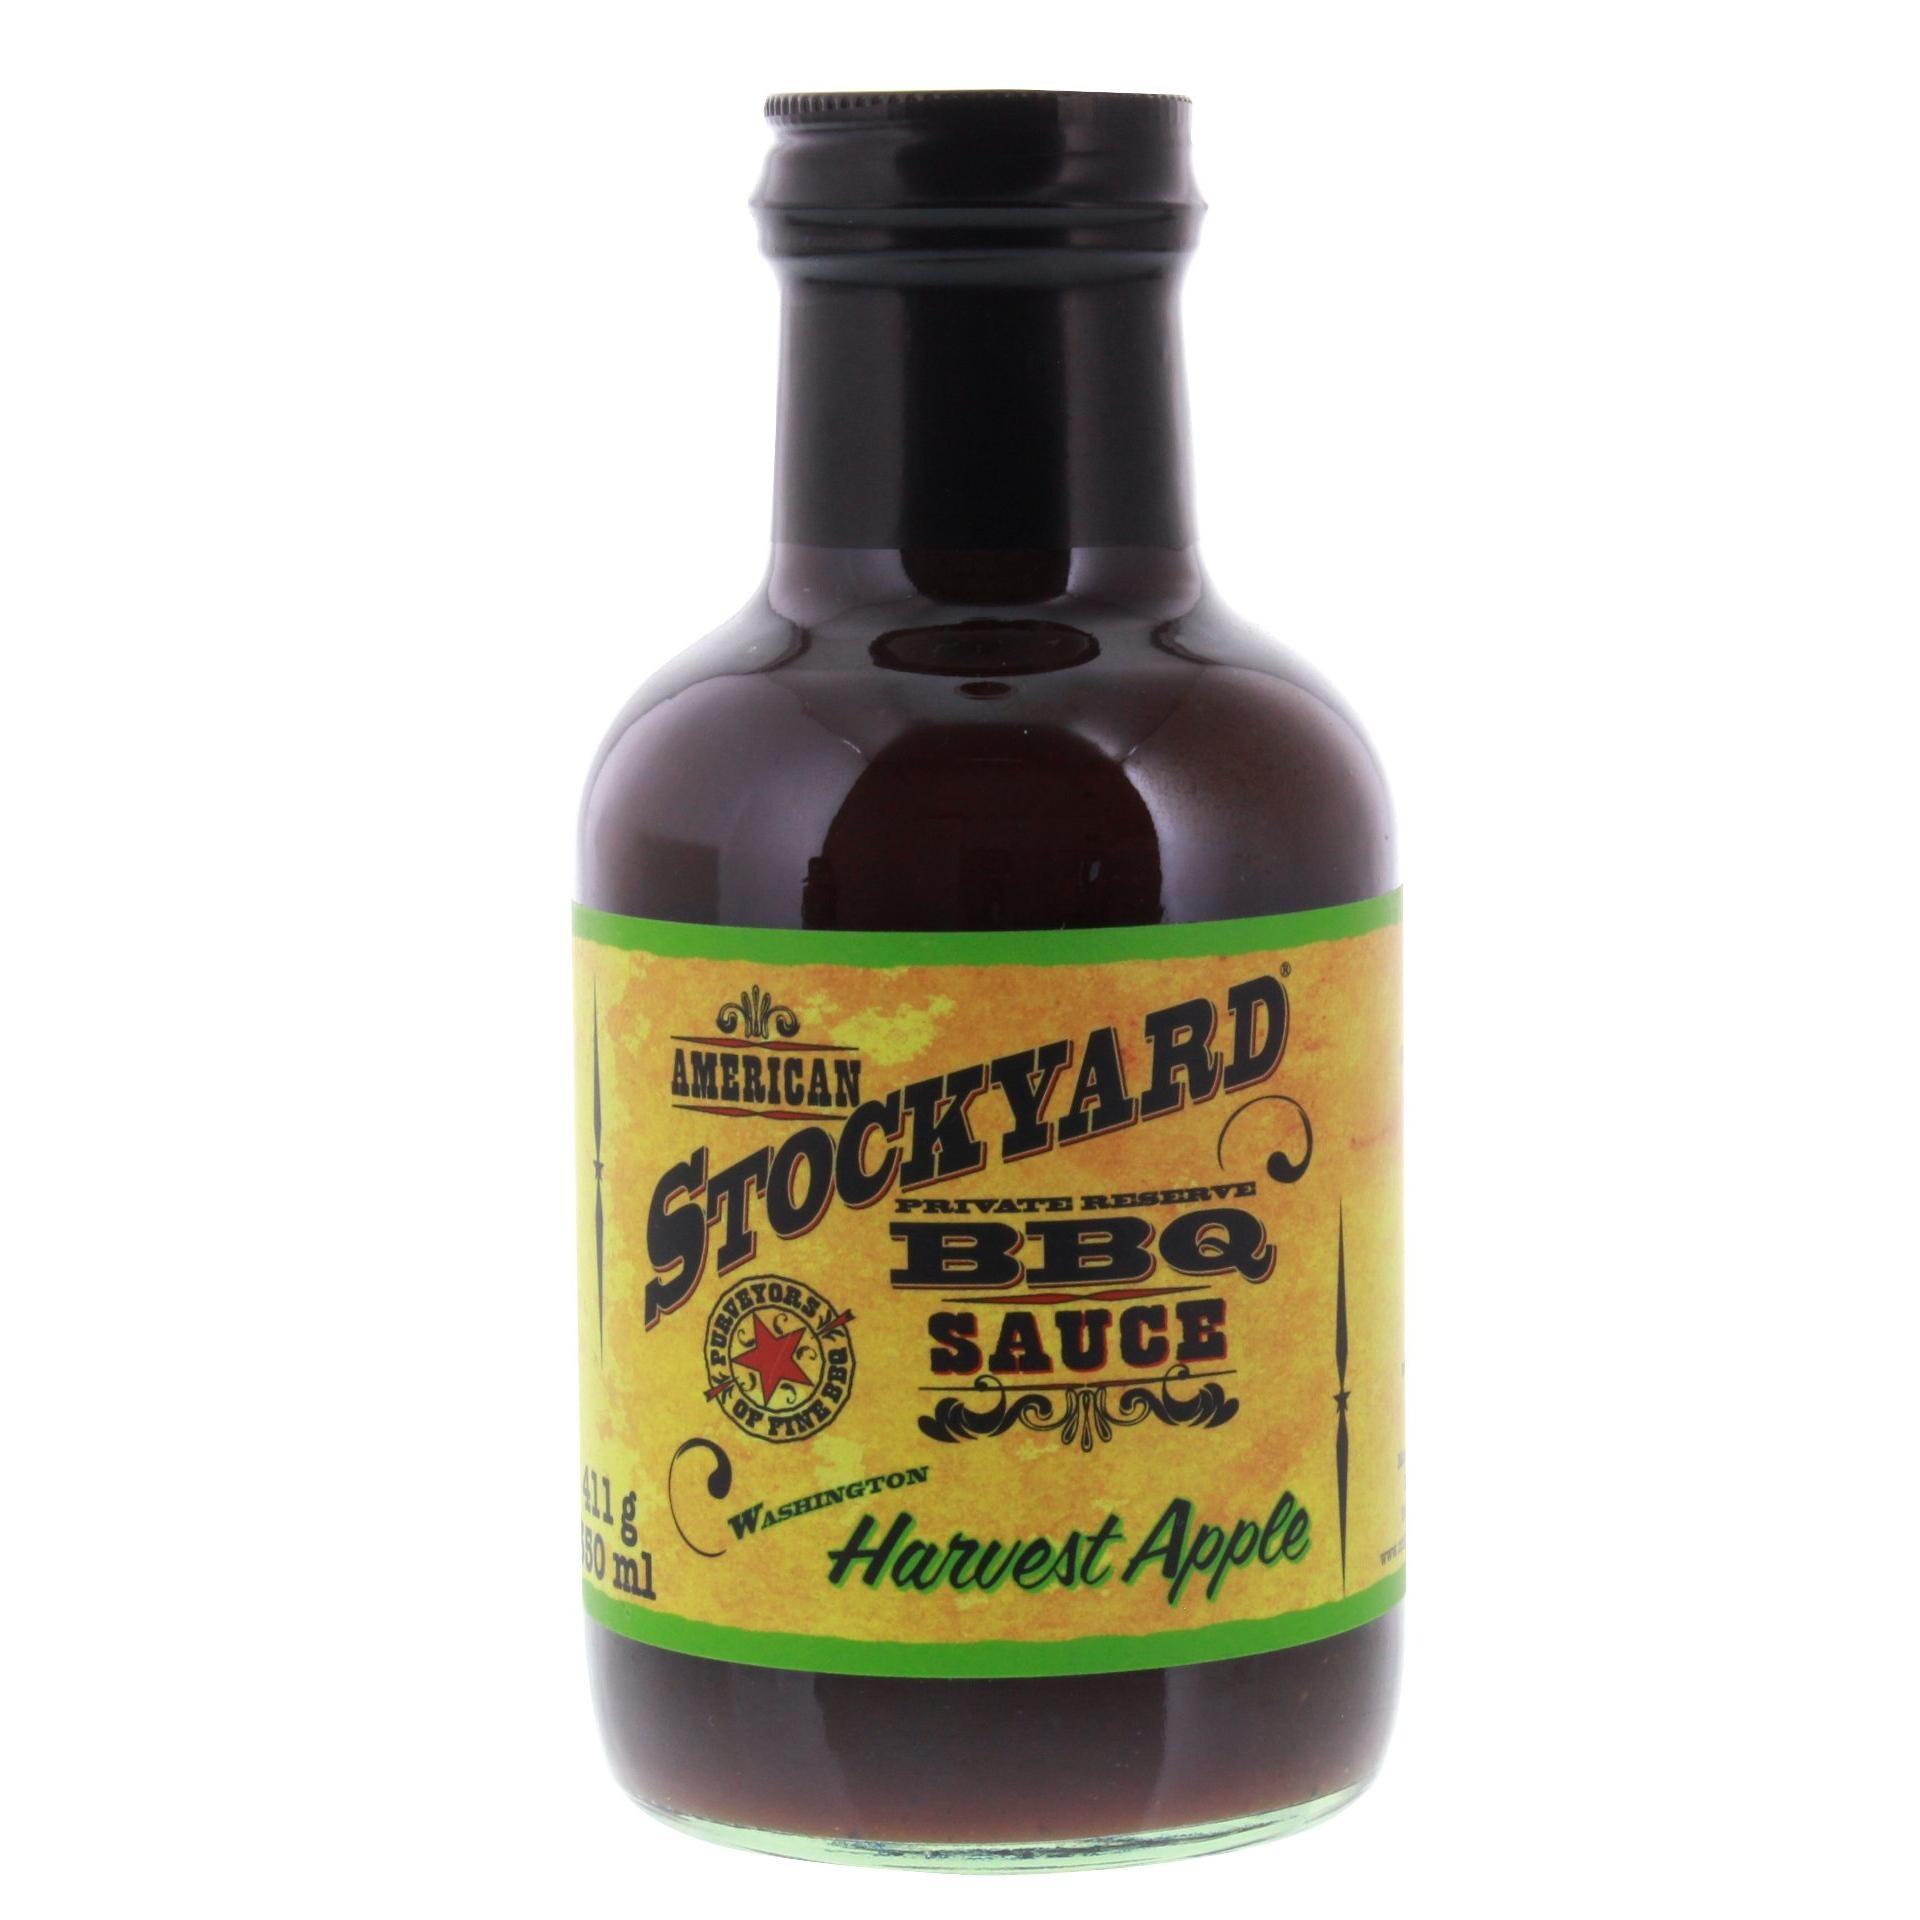 Stockyard - Washington Harvest Apple BBQ Sauce - 350ml